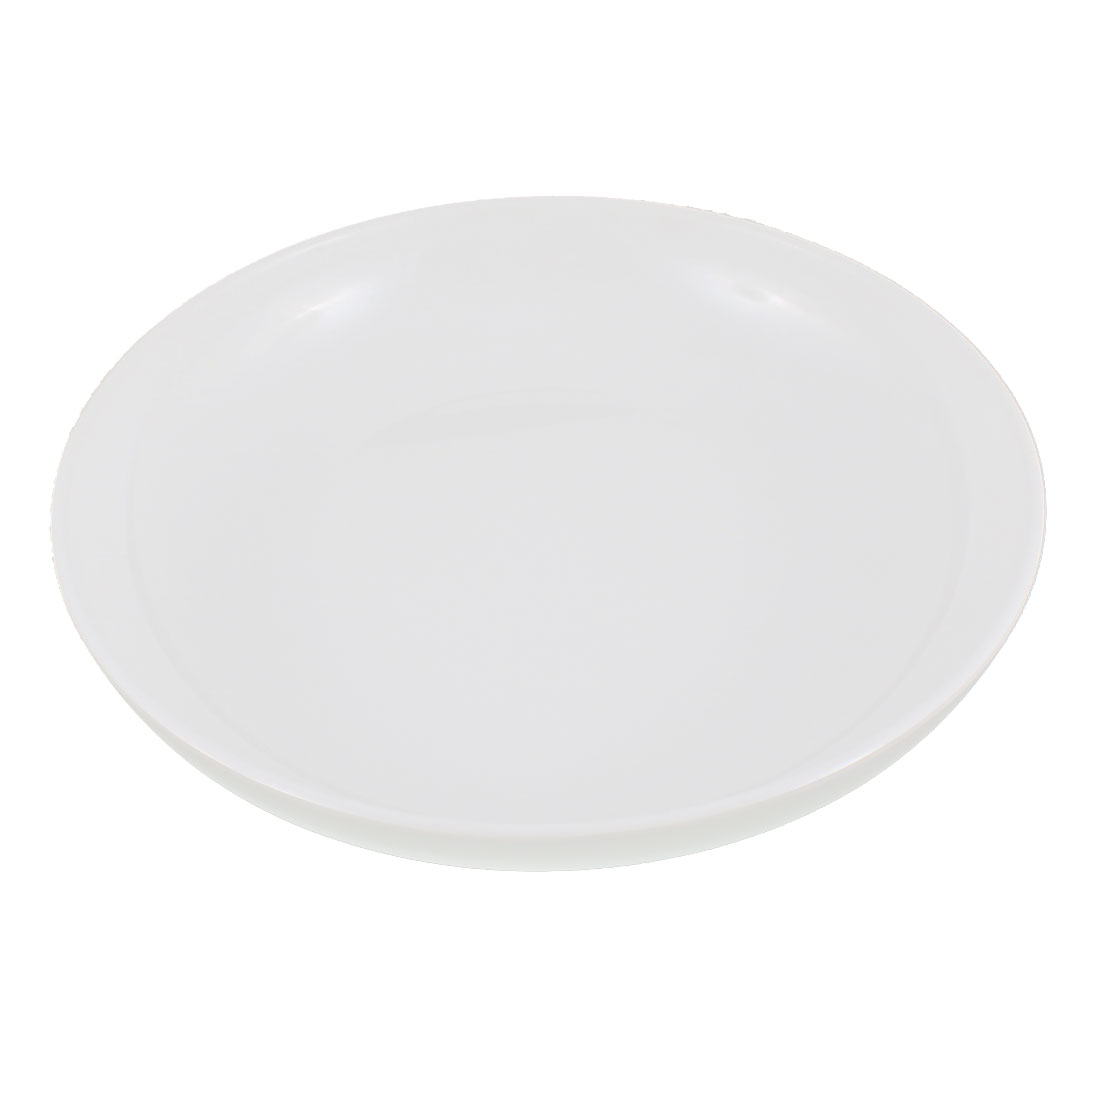 "Kitchenware Round Shape Salad Dish Plate White 9"" Dia"